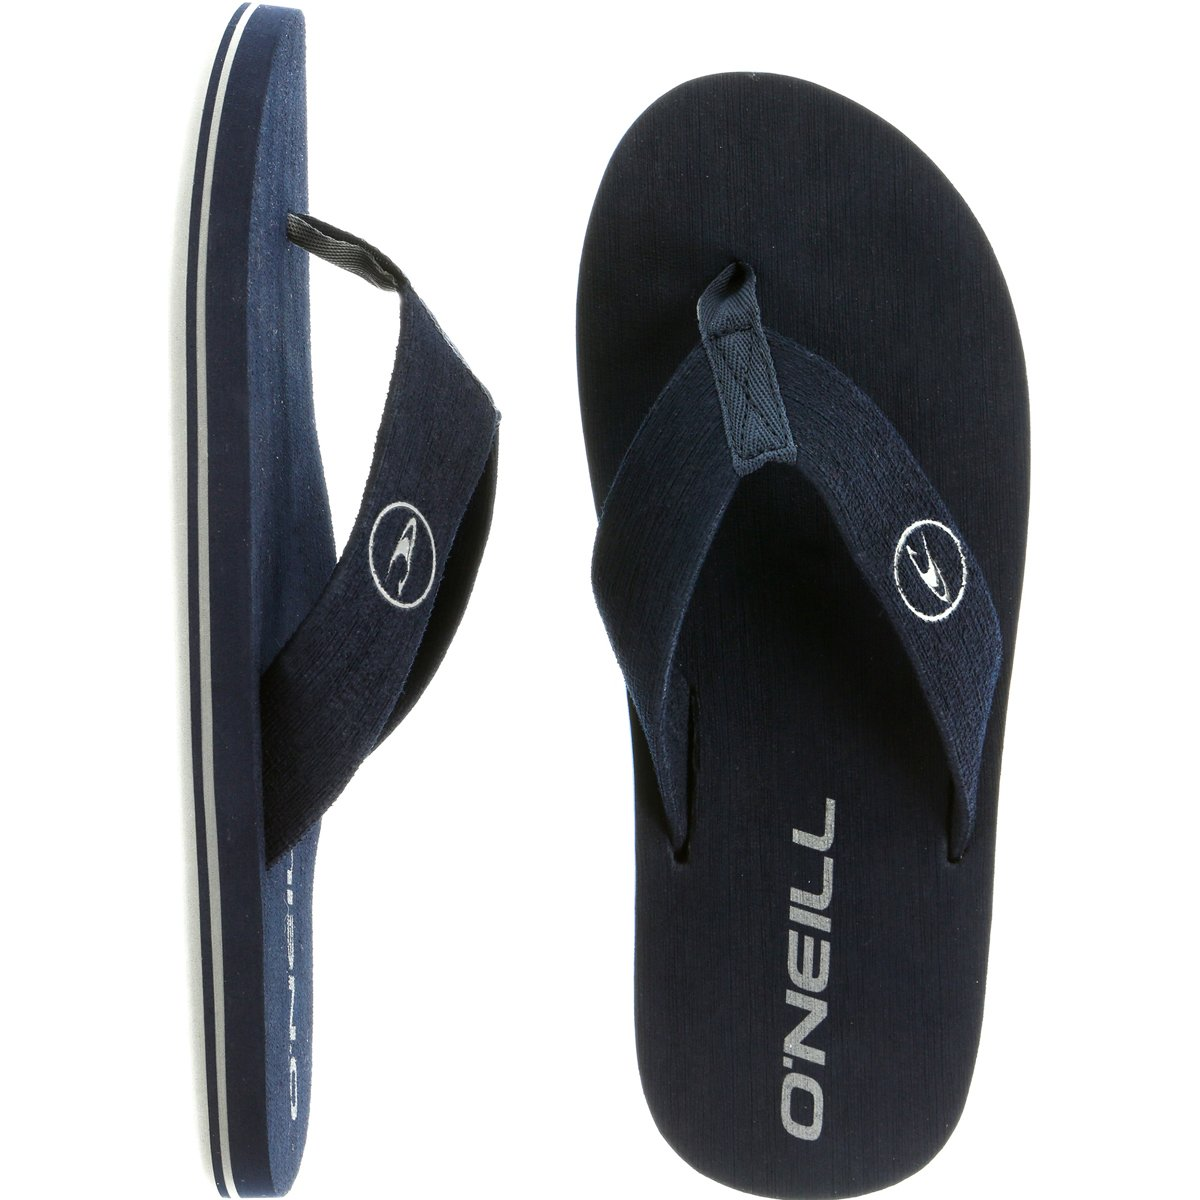 O'Neill Men's Phluff Daddy Flip Flop, Navy, 8 M US